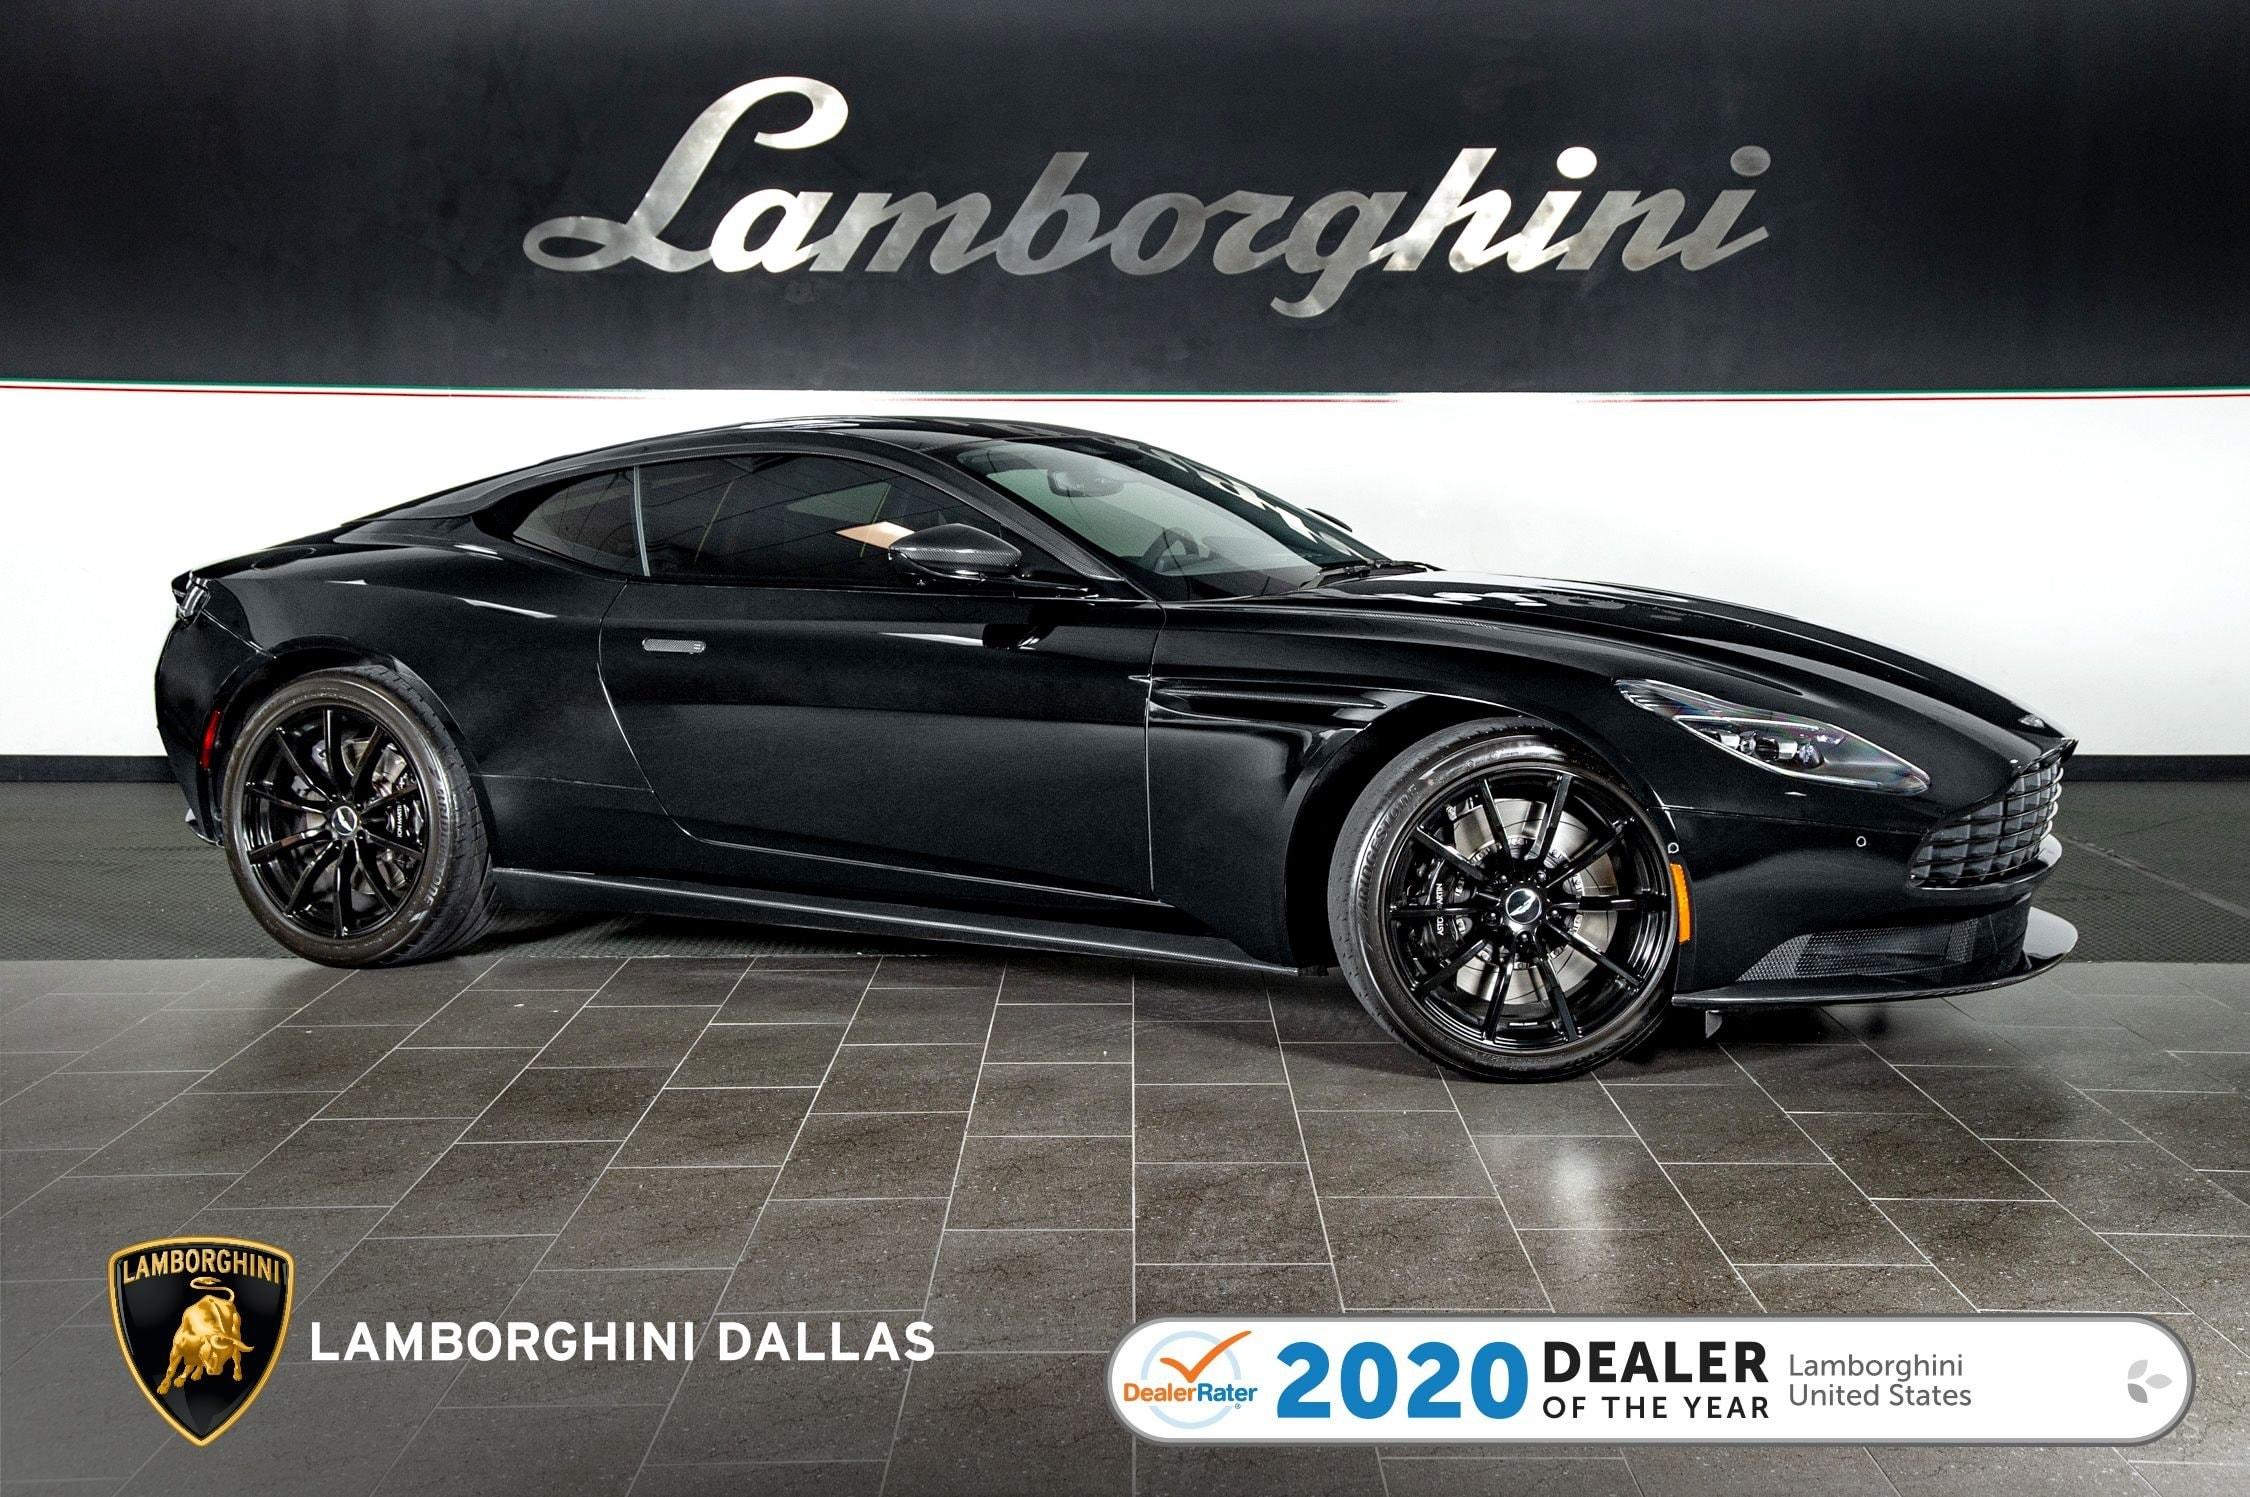 Used 2020 Aston Martin Db11 For Sale Richardson Tx Stock Lc646 Vin Scfrmfevxlgl09572